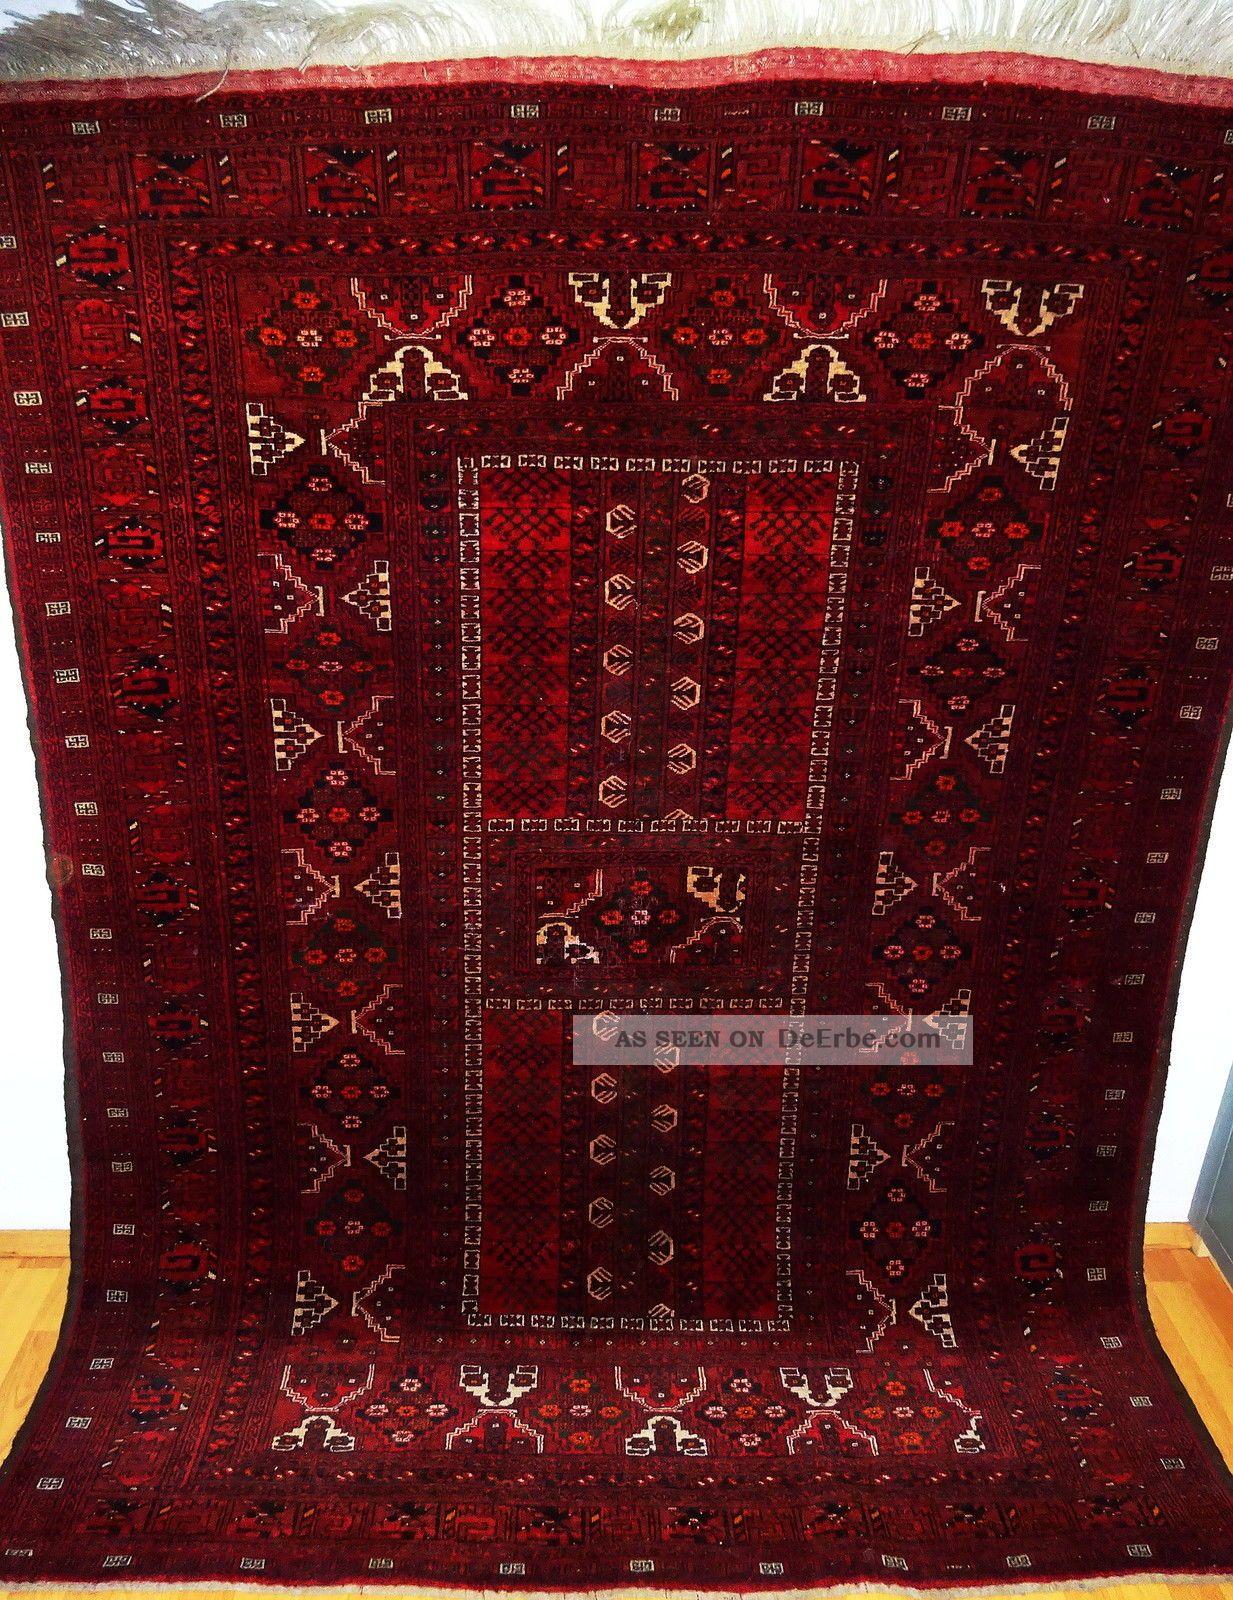 Königlicher Handgeknüpfter Afghan Palast Teppich Rug Tappeto Tapies